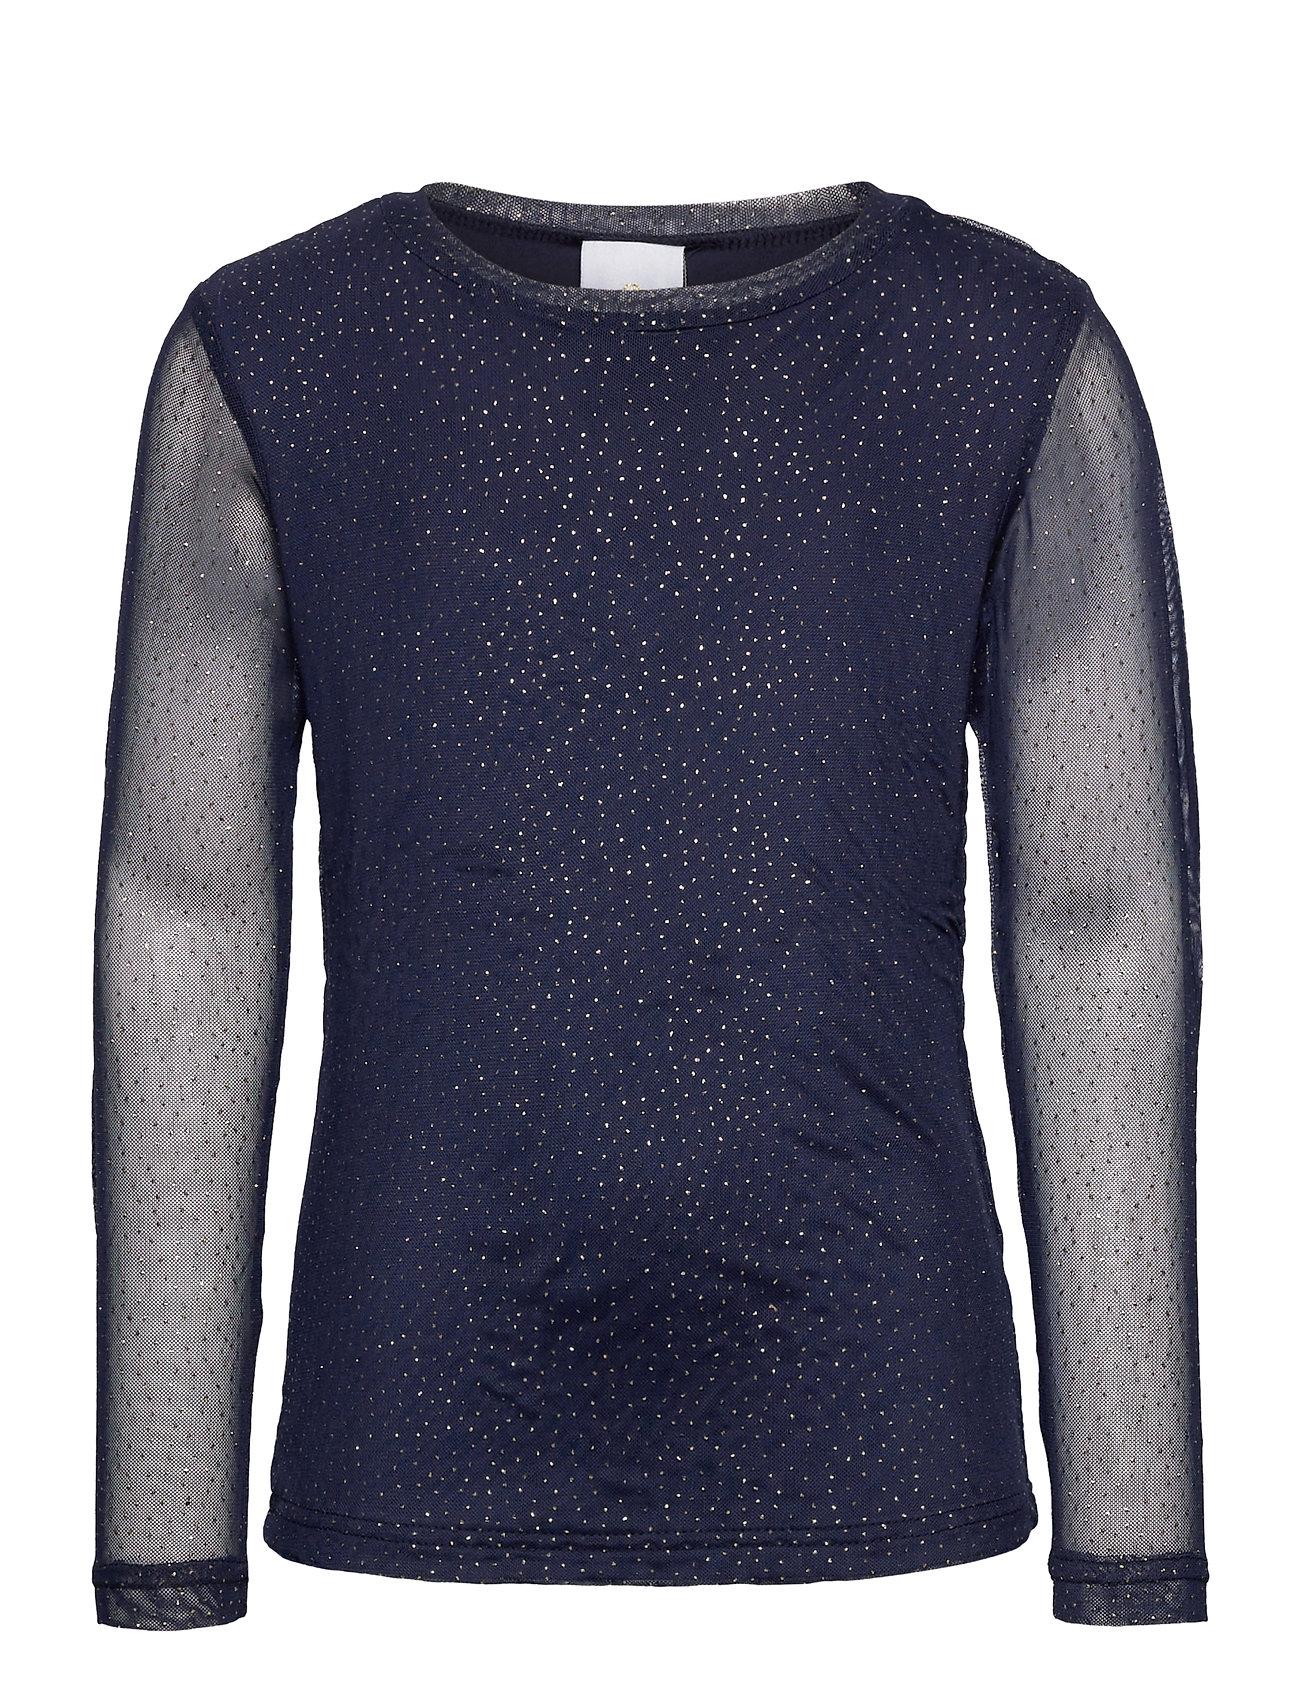 Image of Rachel L_s Top Bluse Tunika Blå The New (3454143709)